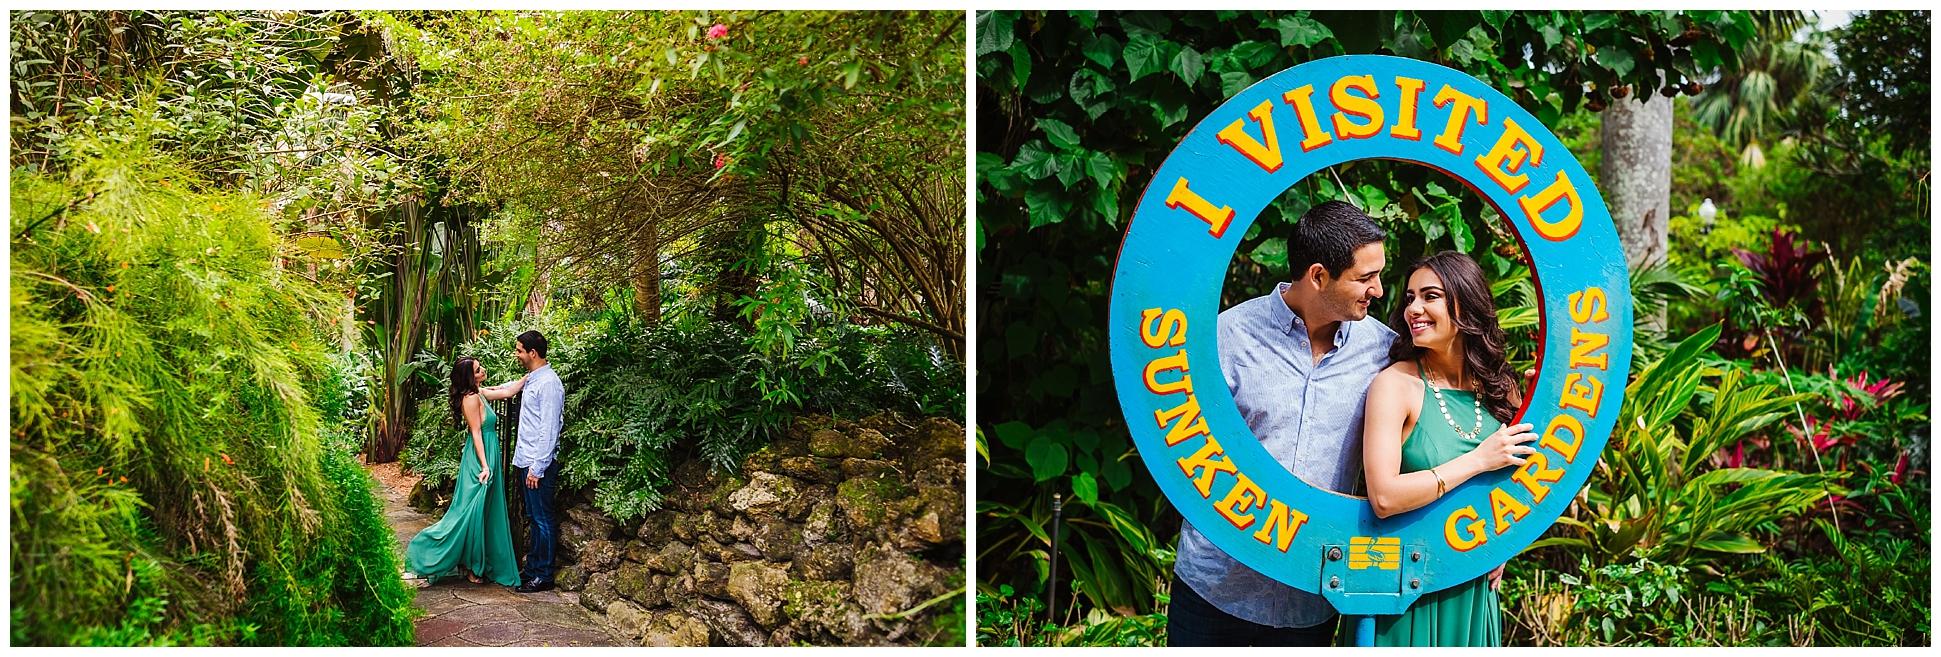 sunken-gardens-engagement-session-photos-teal-flamingos_0008.jpg